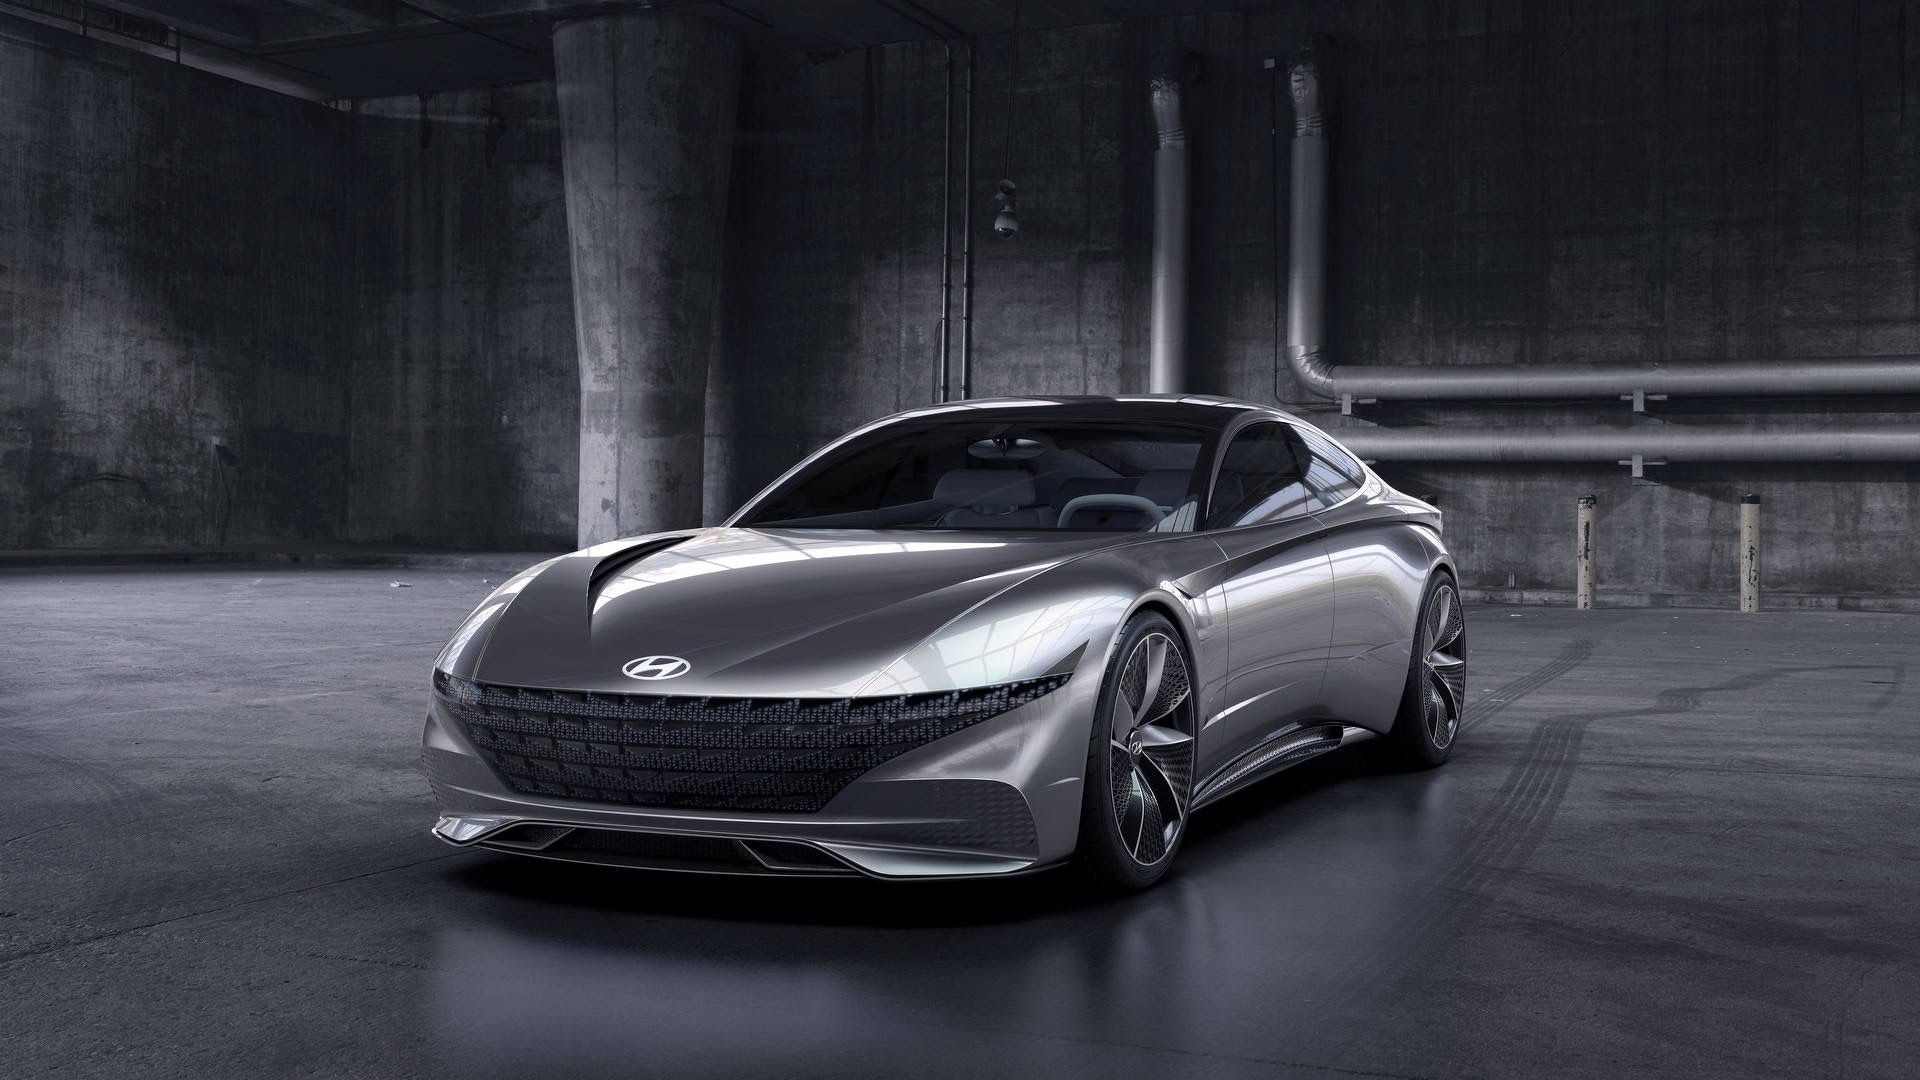 Hyundai Le Fil Rouge Concept Geneva 2018 4k Wallpapers Hd Wallpapers Id 23306